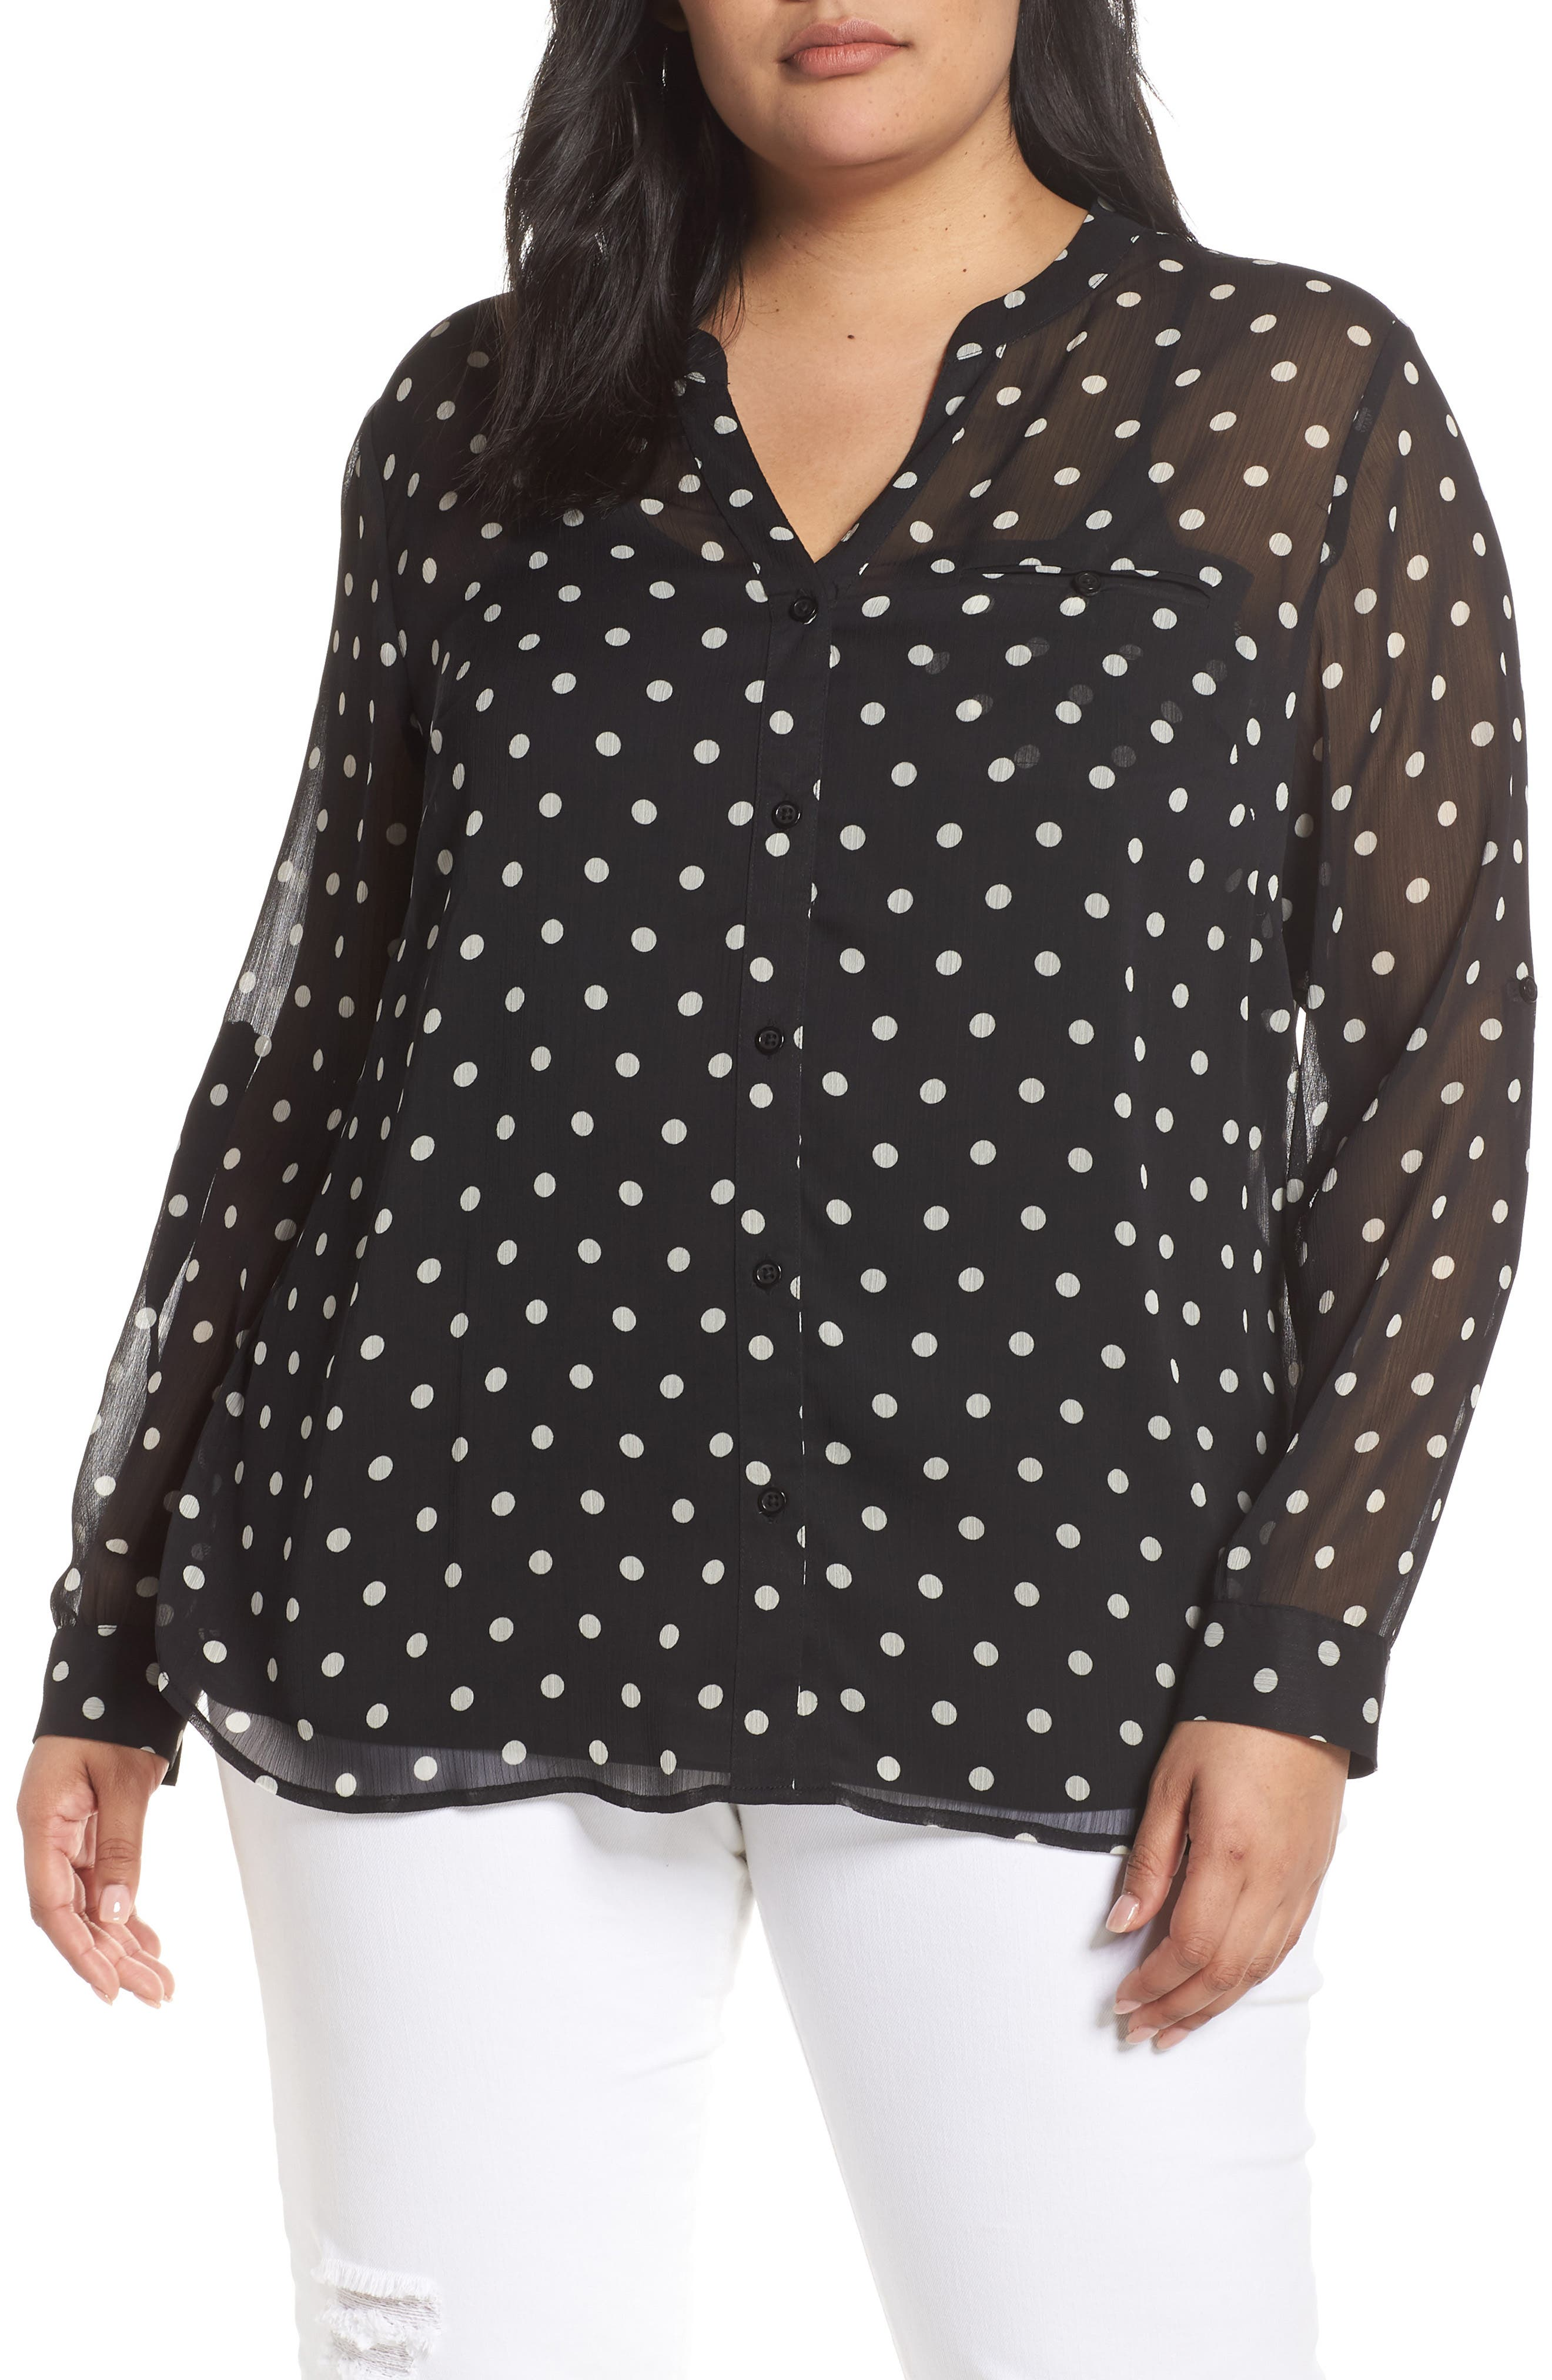 KUT FROM THE KLOTH Jasmine Roll Sleeve Top, Main, color, JULIA BLACK